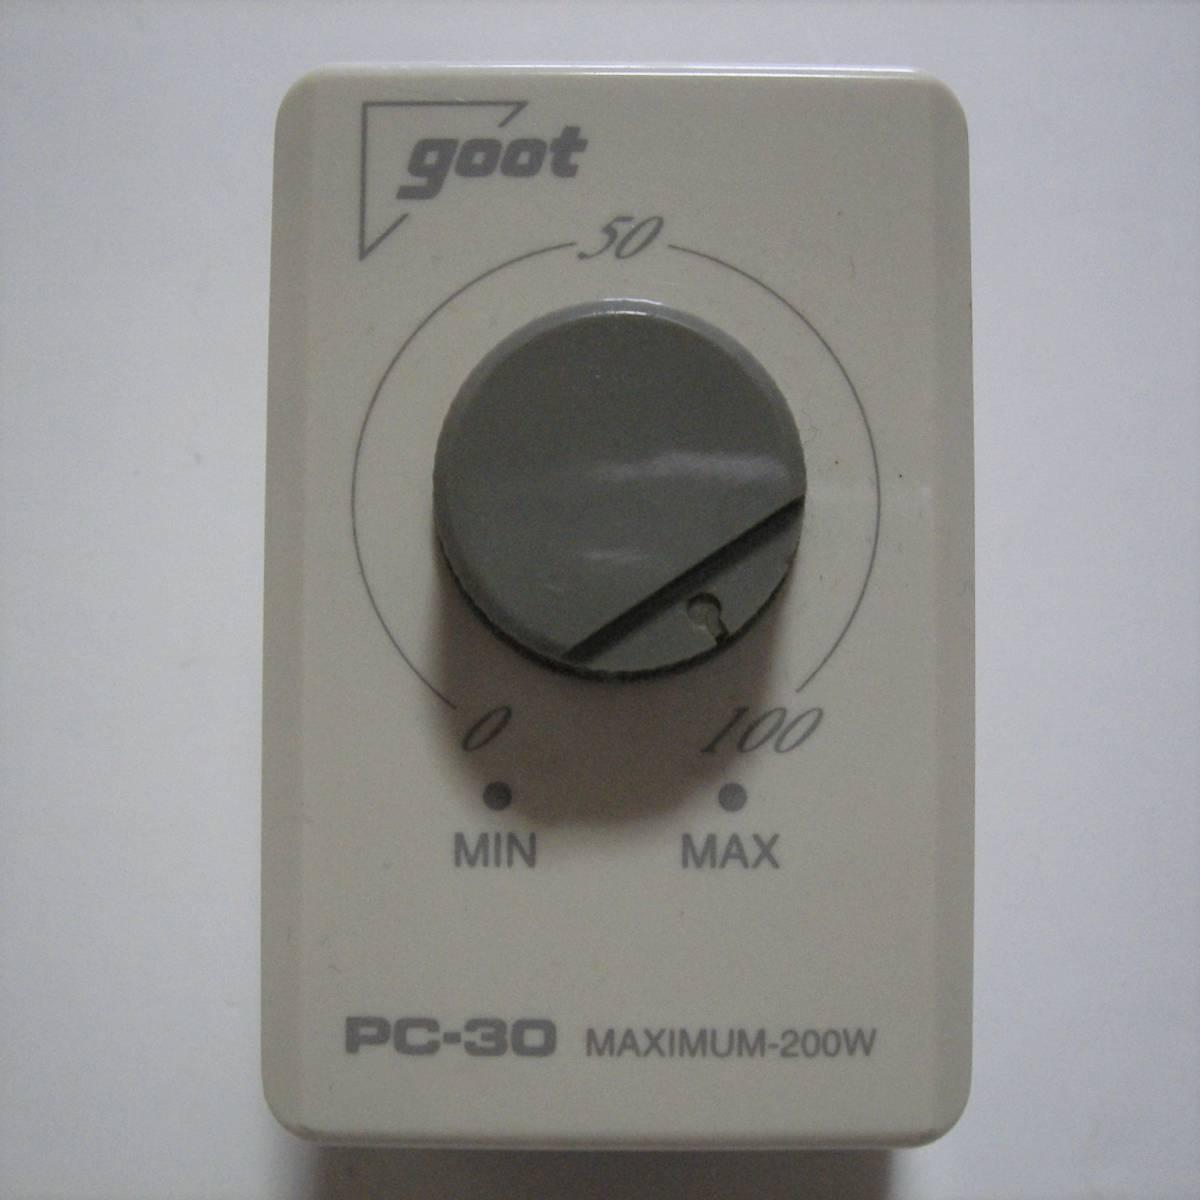 goot / 太洋電気産業 ライトコントローラー PC-30 廃番商品 半田ごてや白熱電球に対応